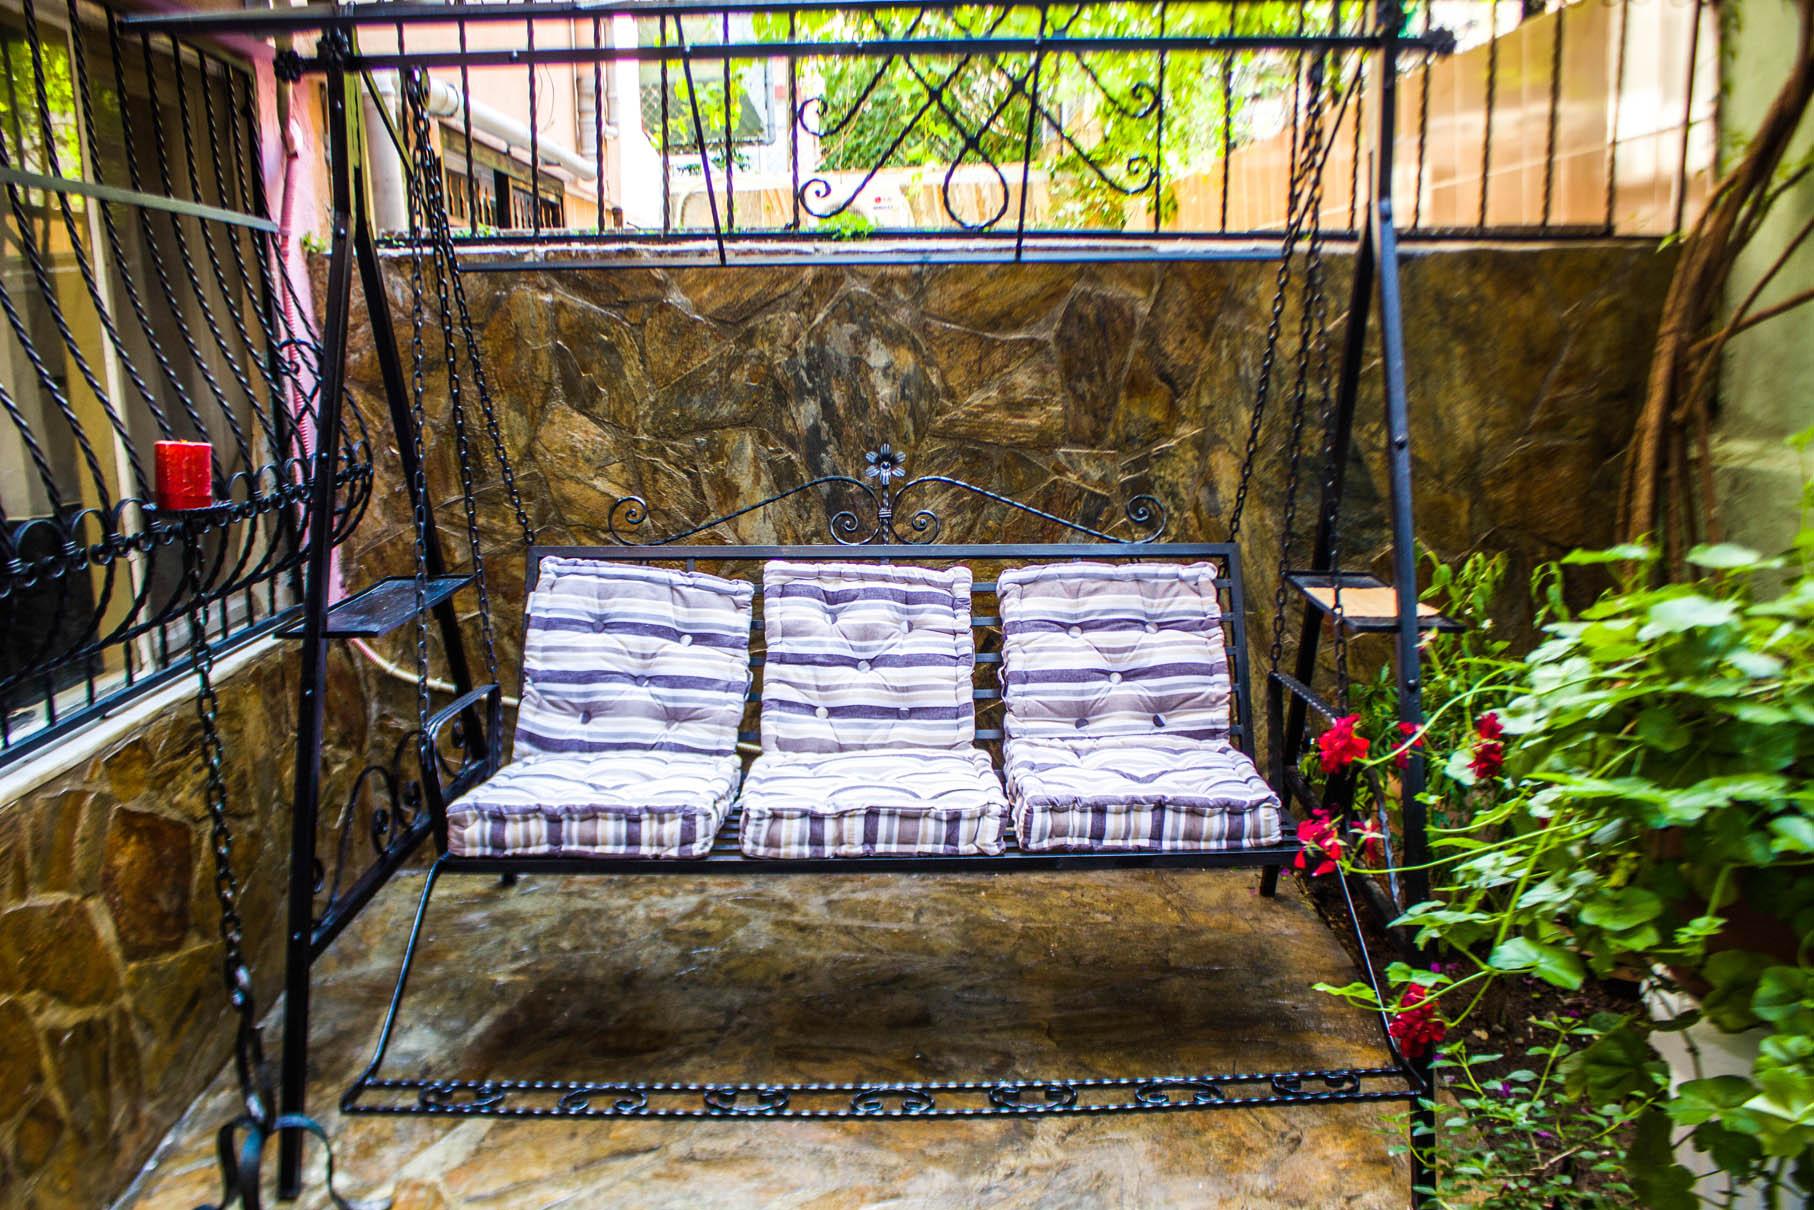 Balcony garden swing with an industrial look